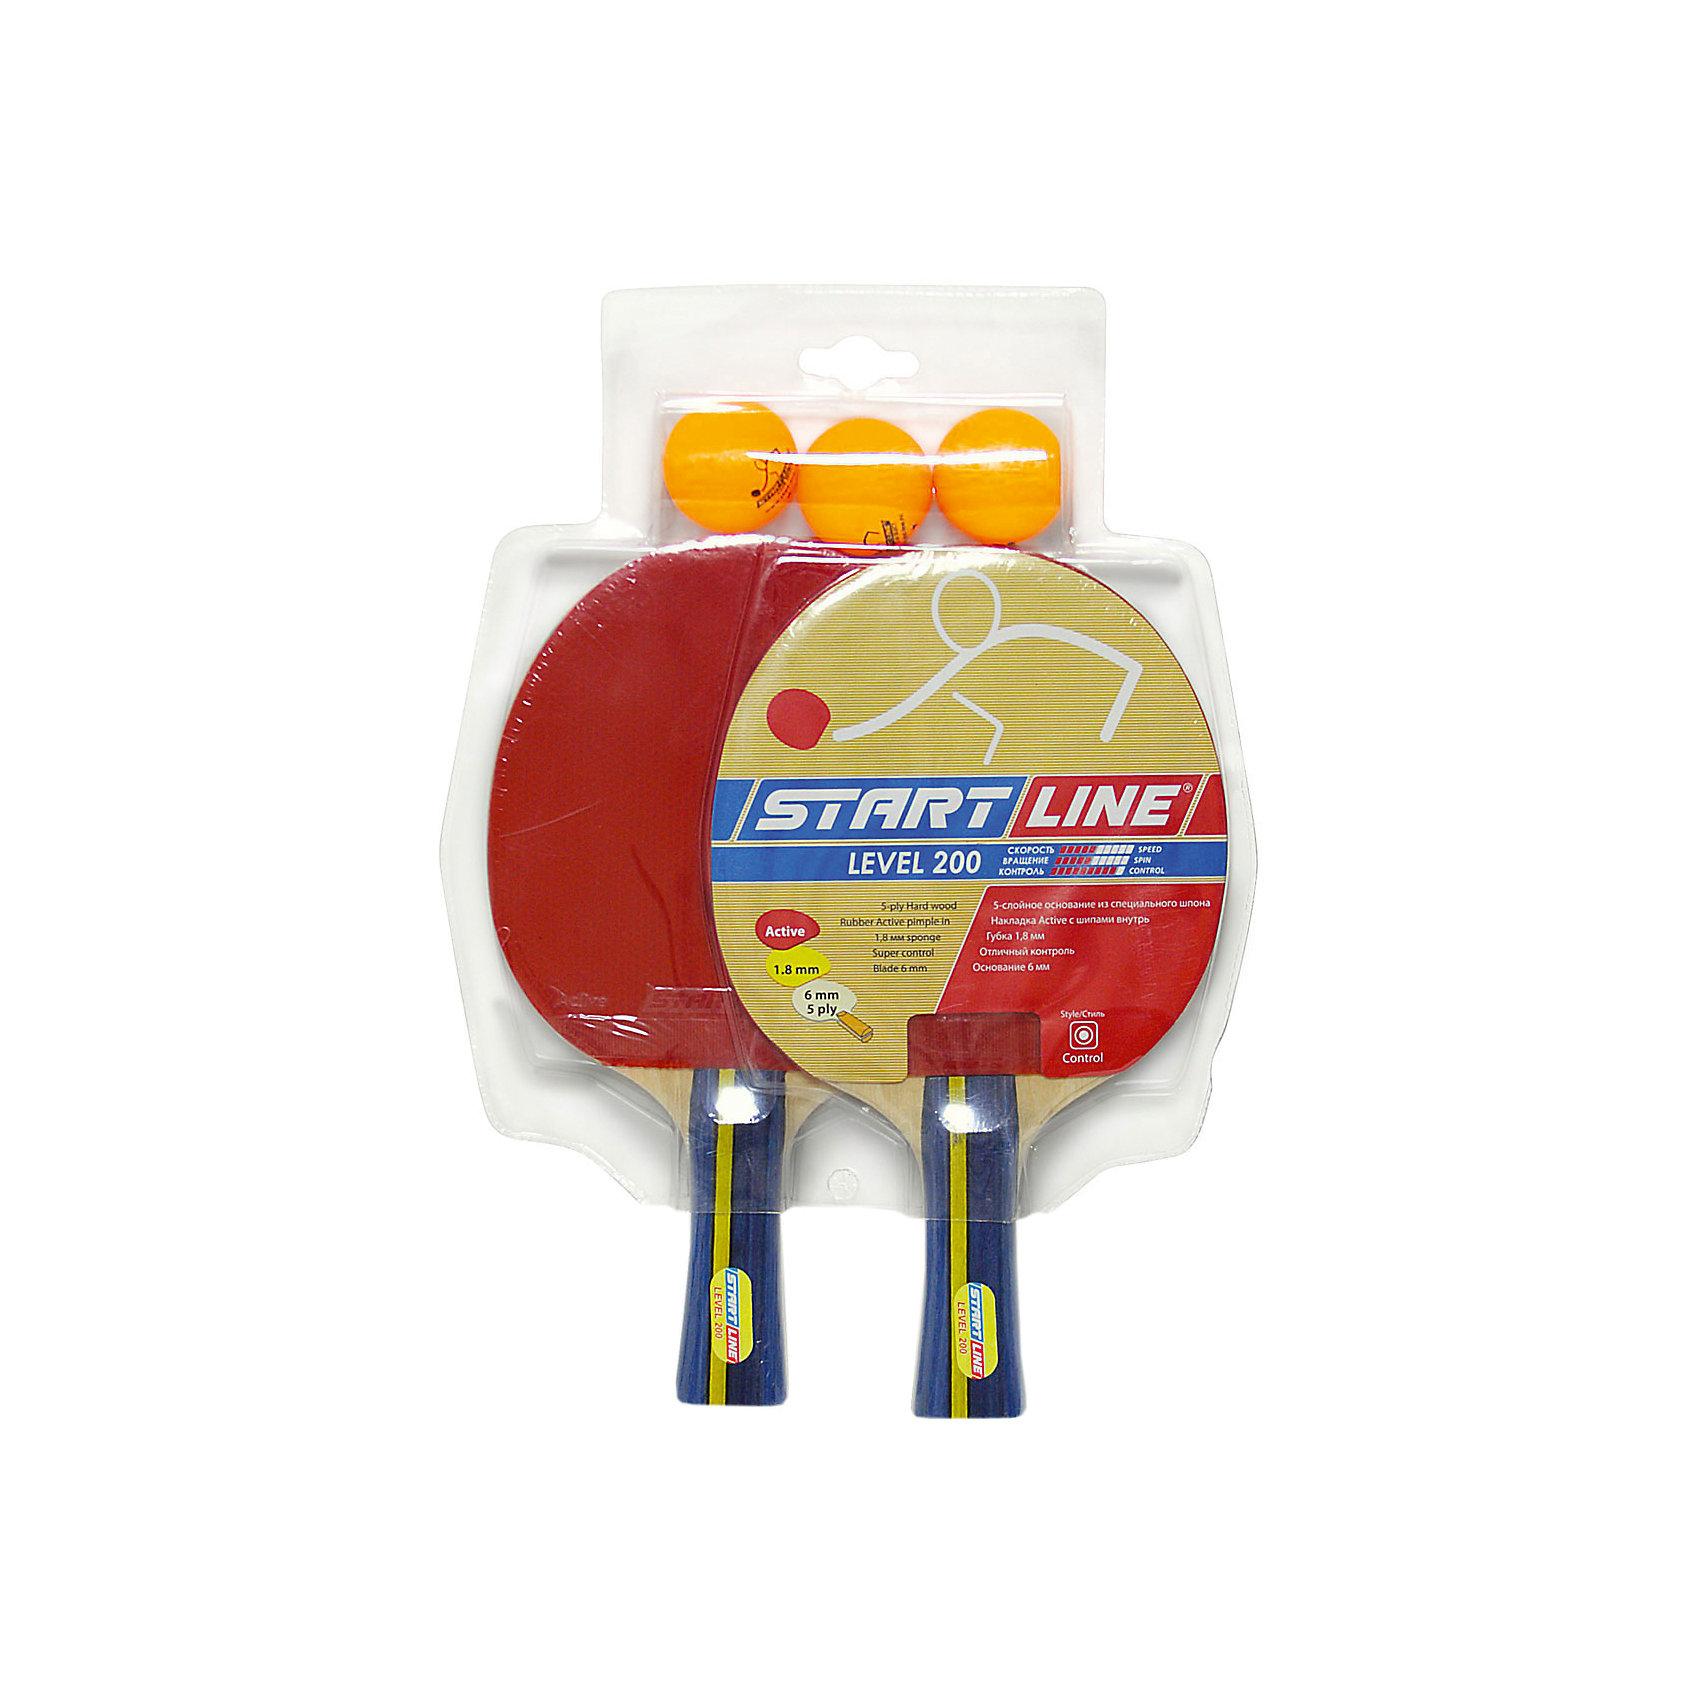 - Набор теннисных ракеток Level 200 2шт, мячи Club Select, 3 шт